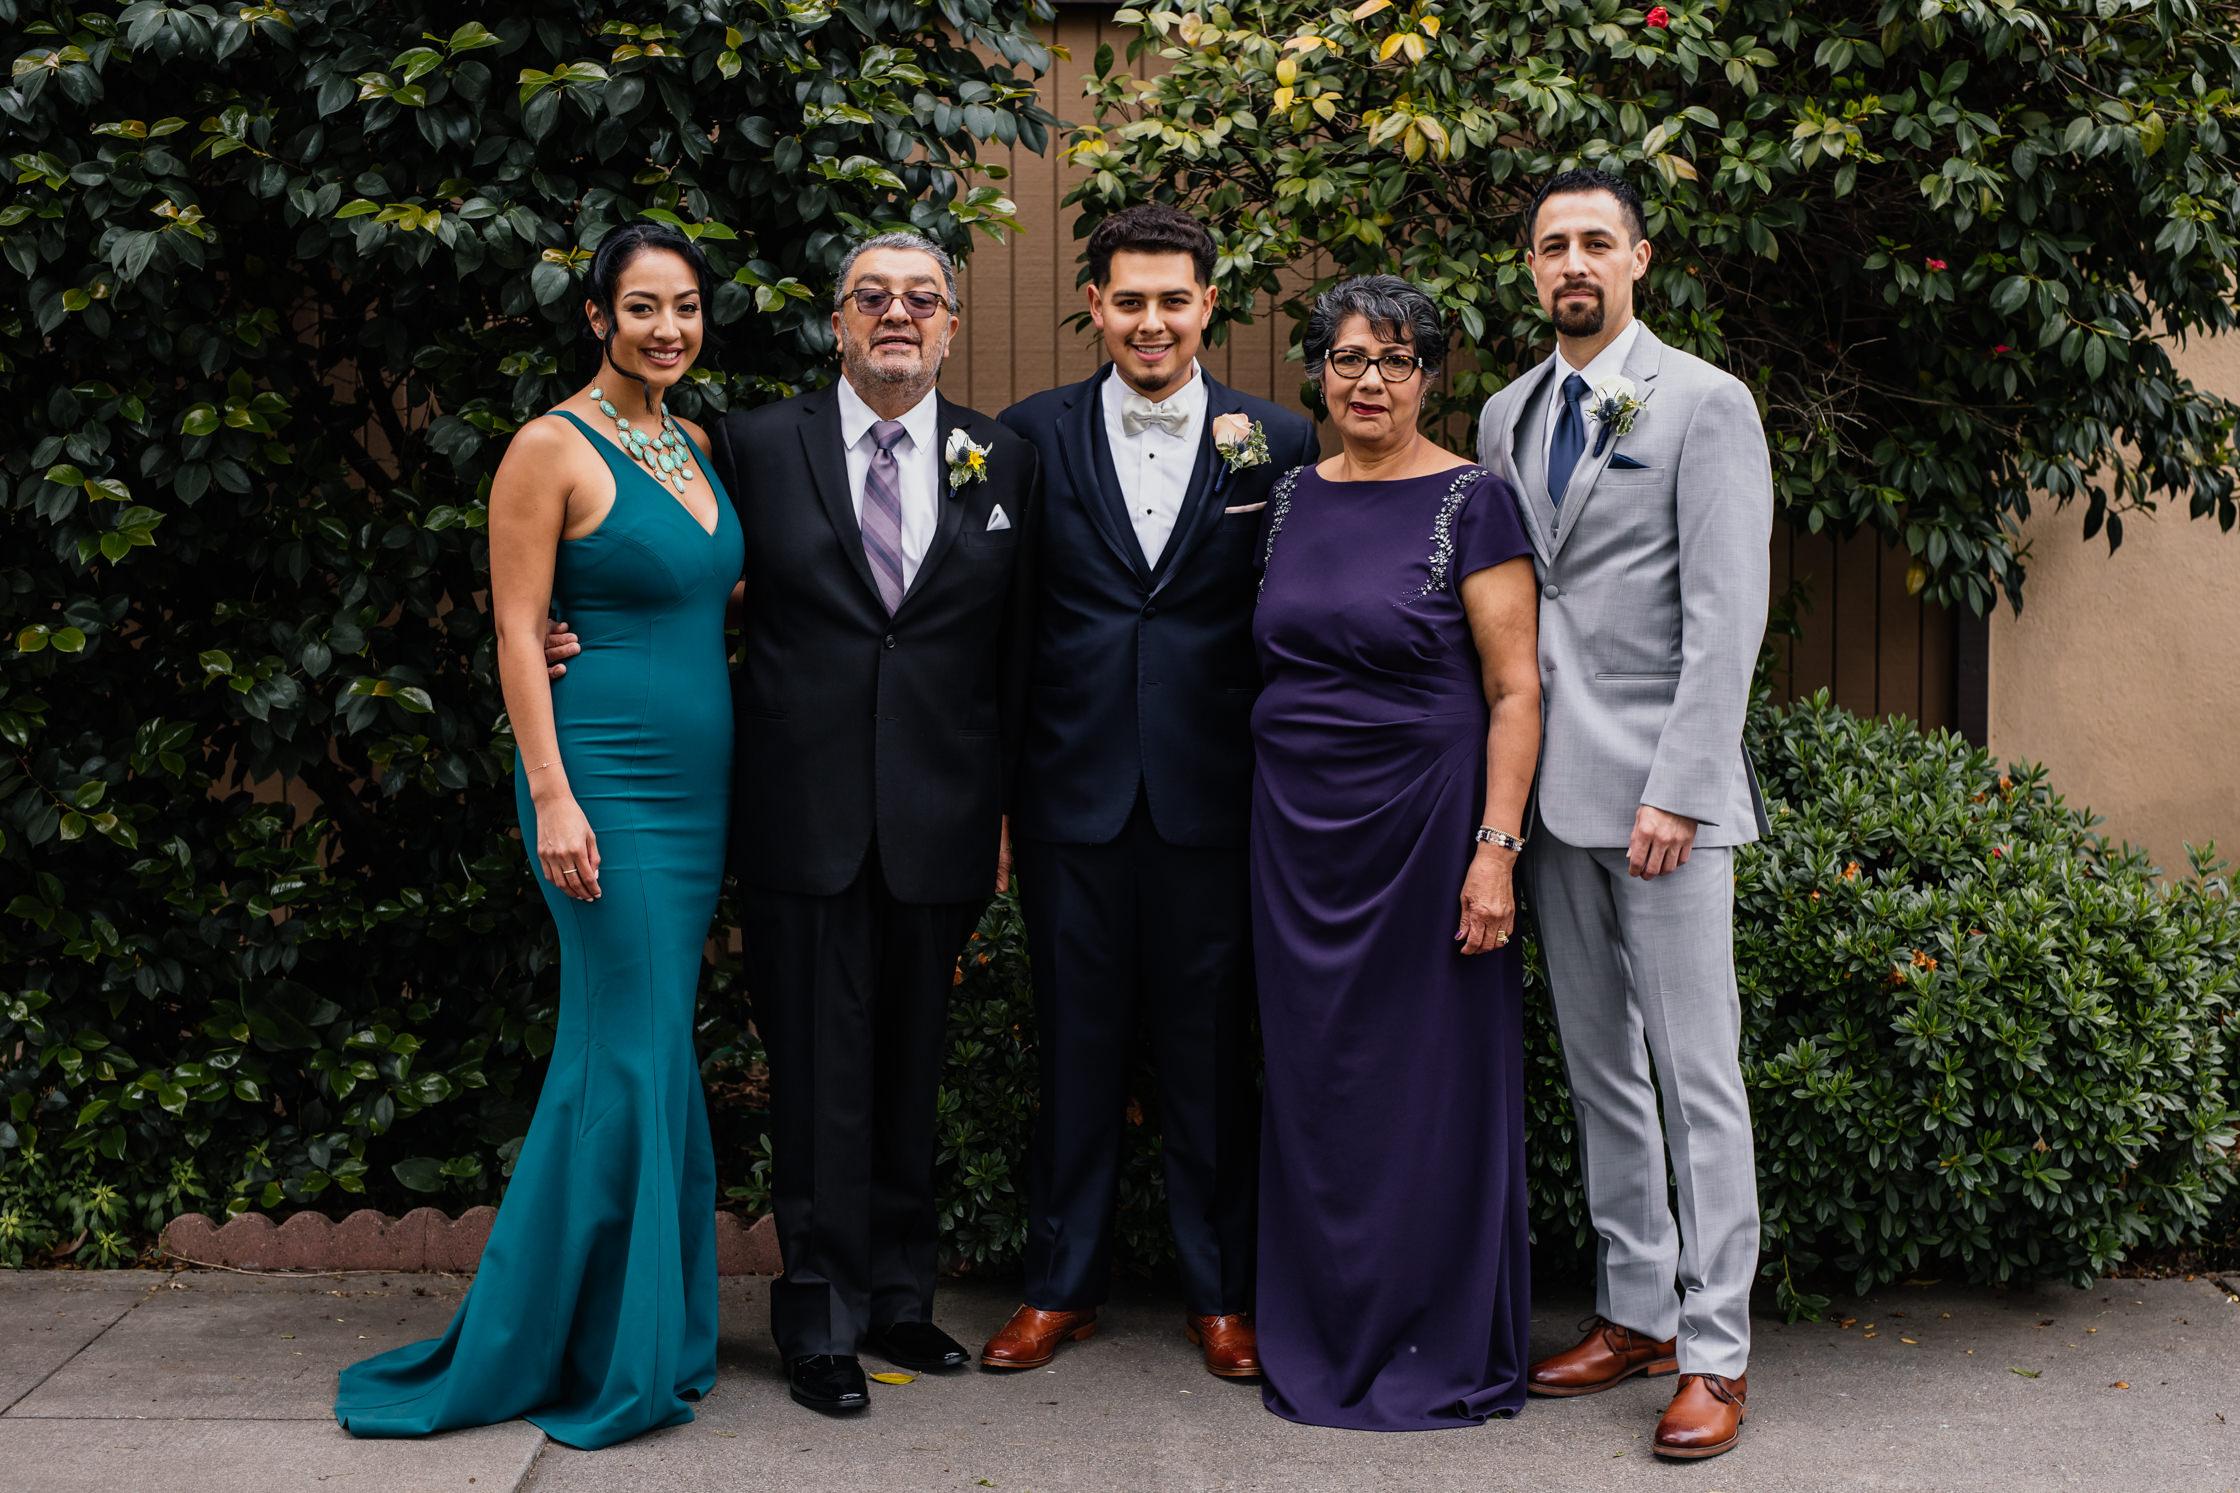 luis_joanna_wedding-6.jpg